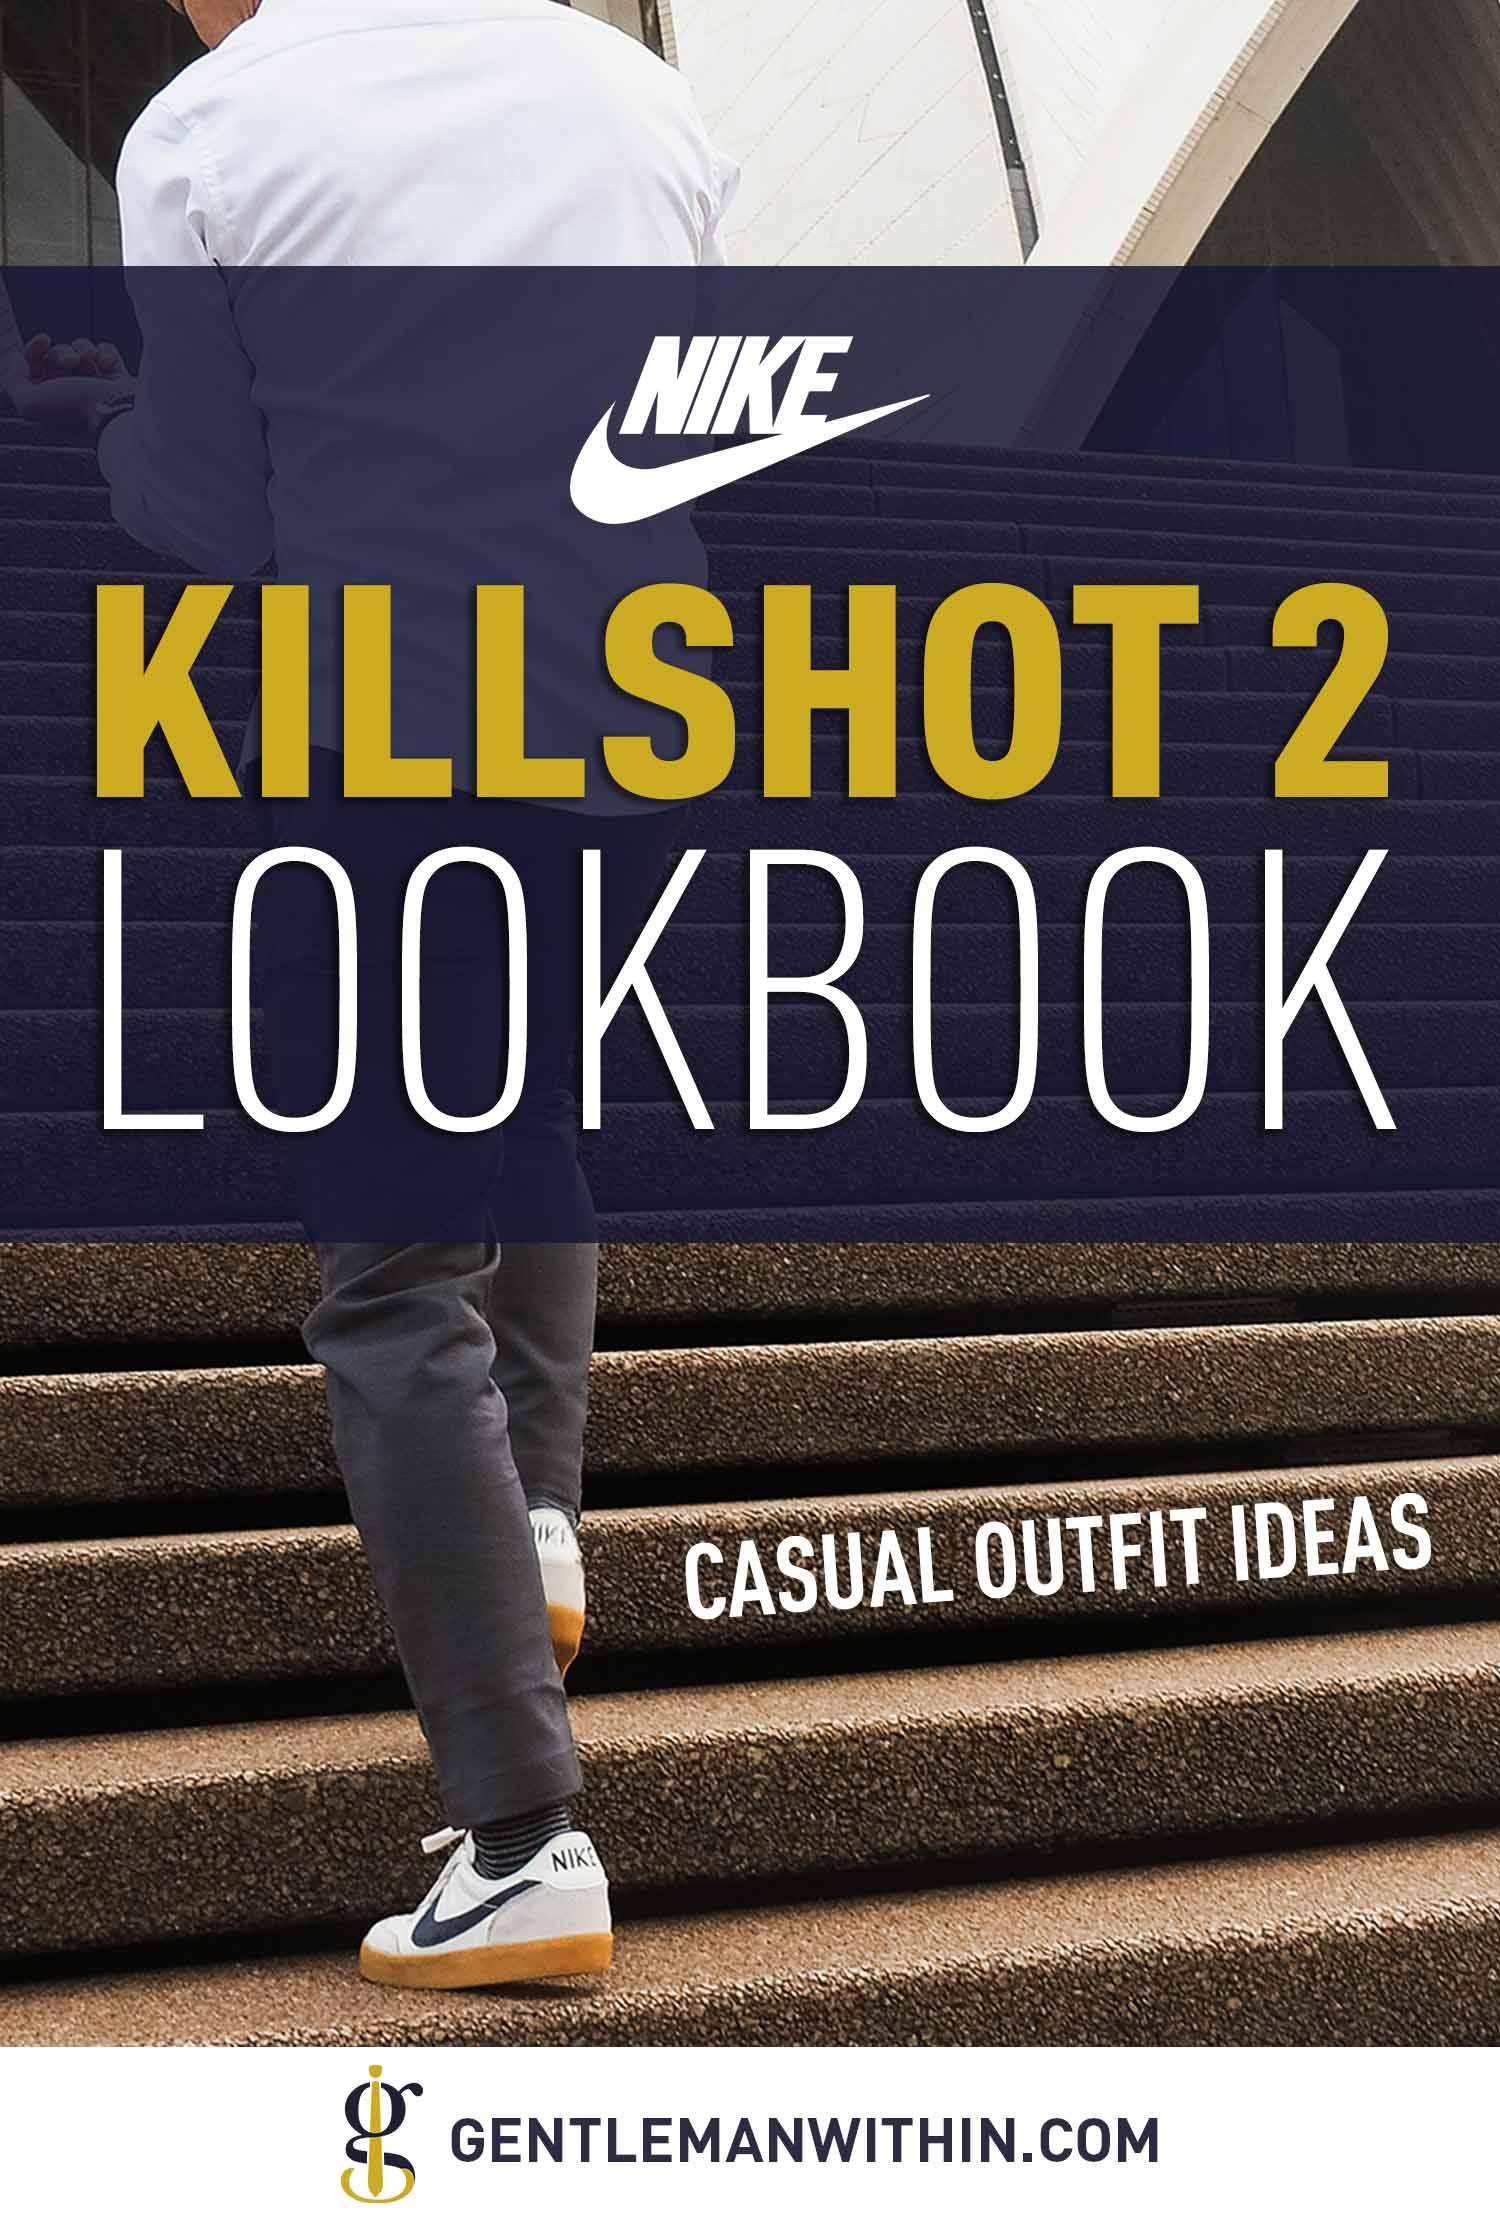 Nike Killshot 2 Outfit Inspiration (A